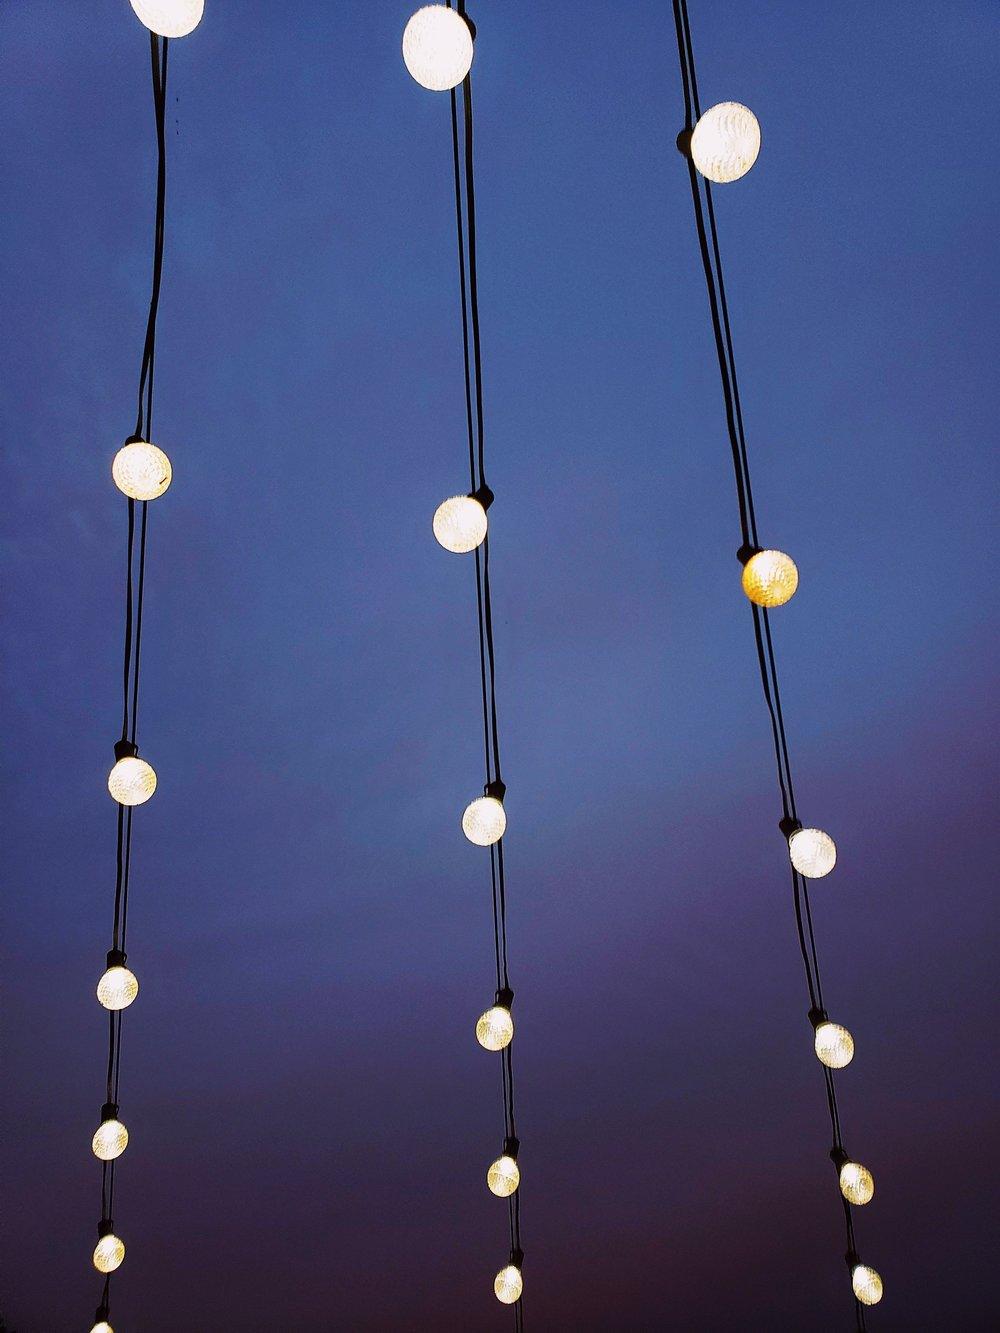 illuminated-light-bulbs-lights-1546605.jpg